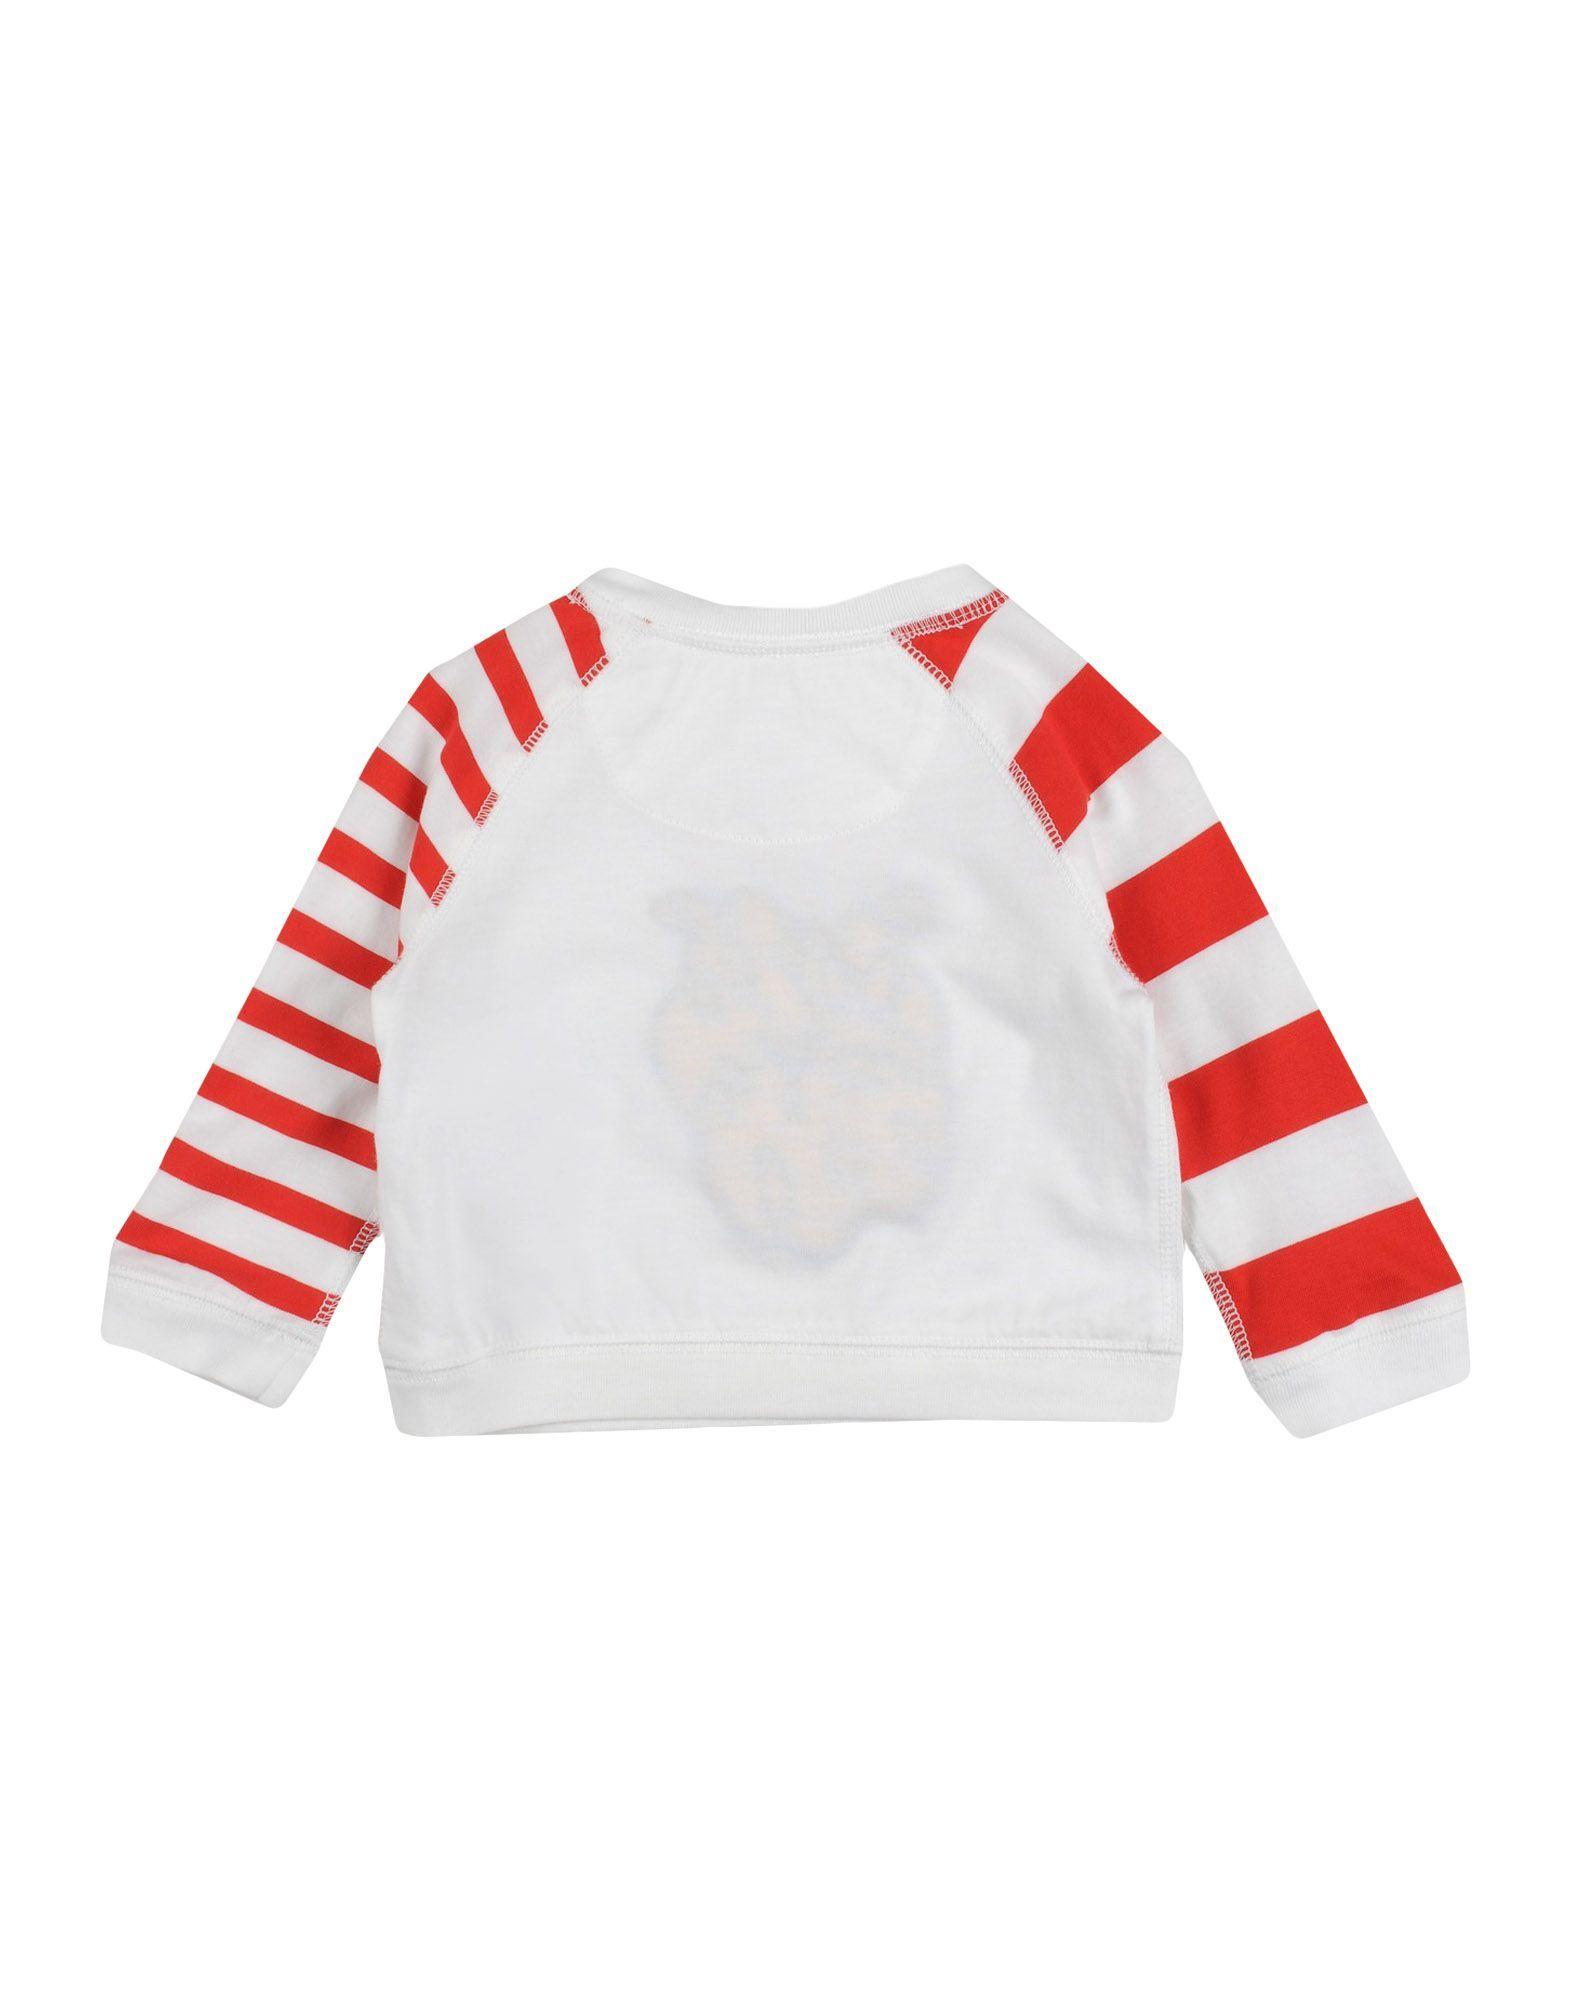 TOPWEAR Burberry White Boy Cotton